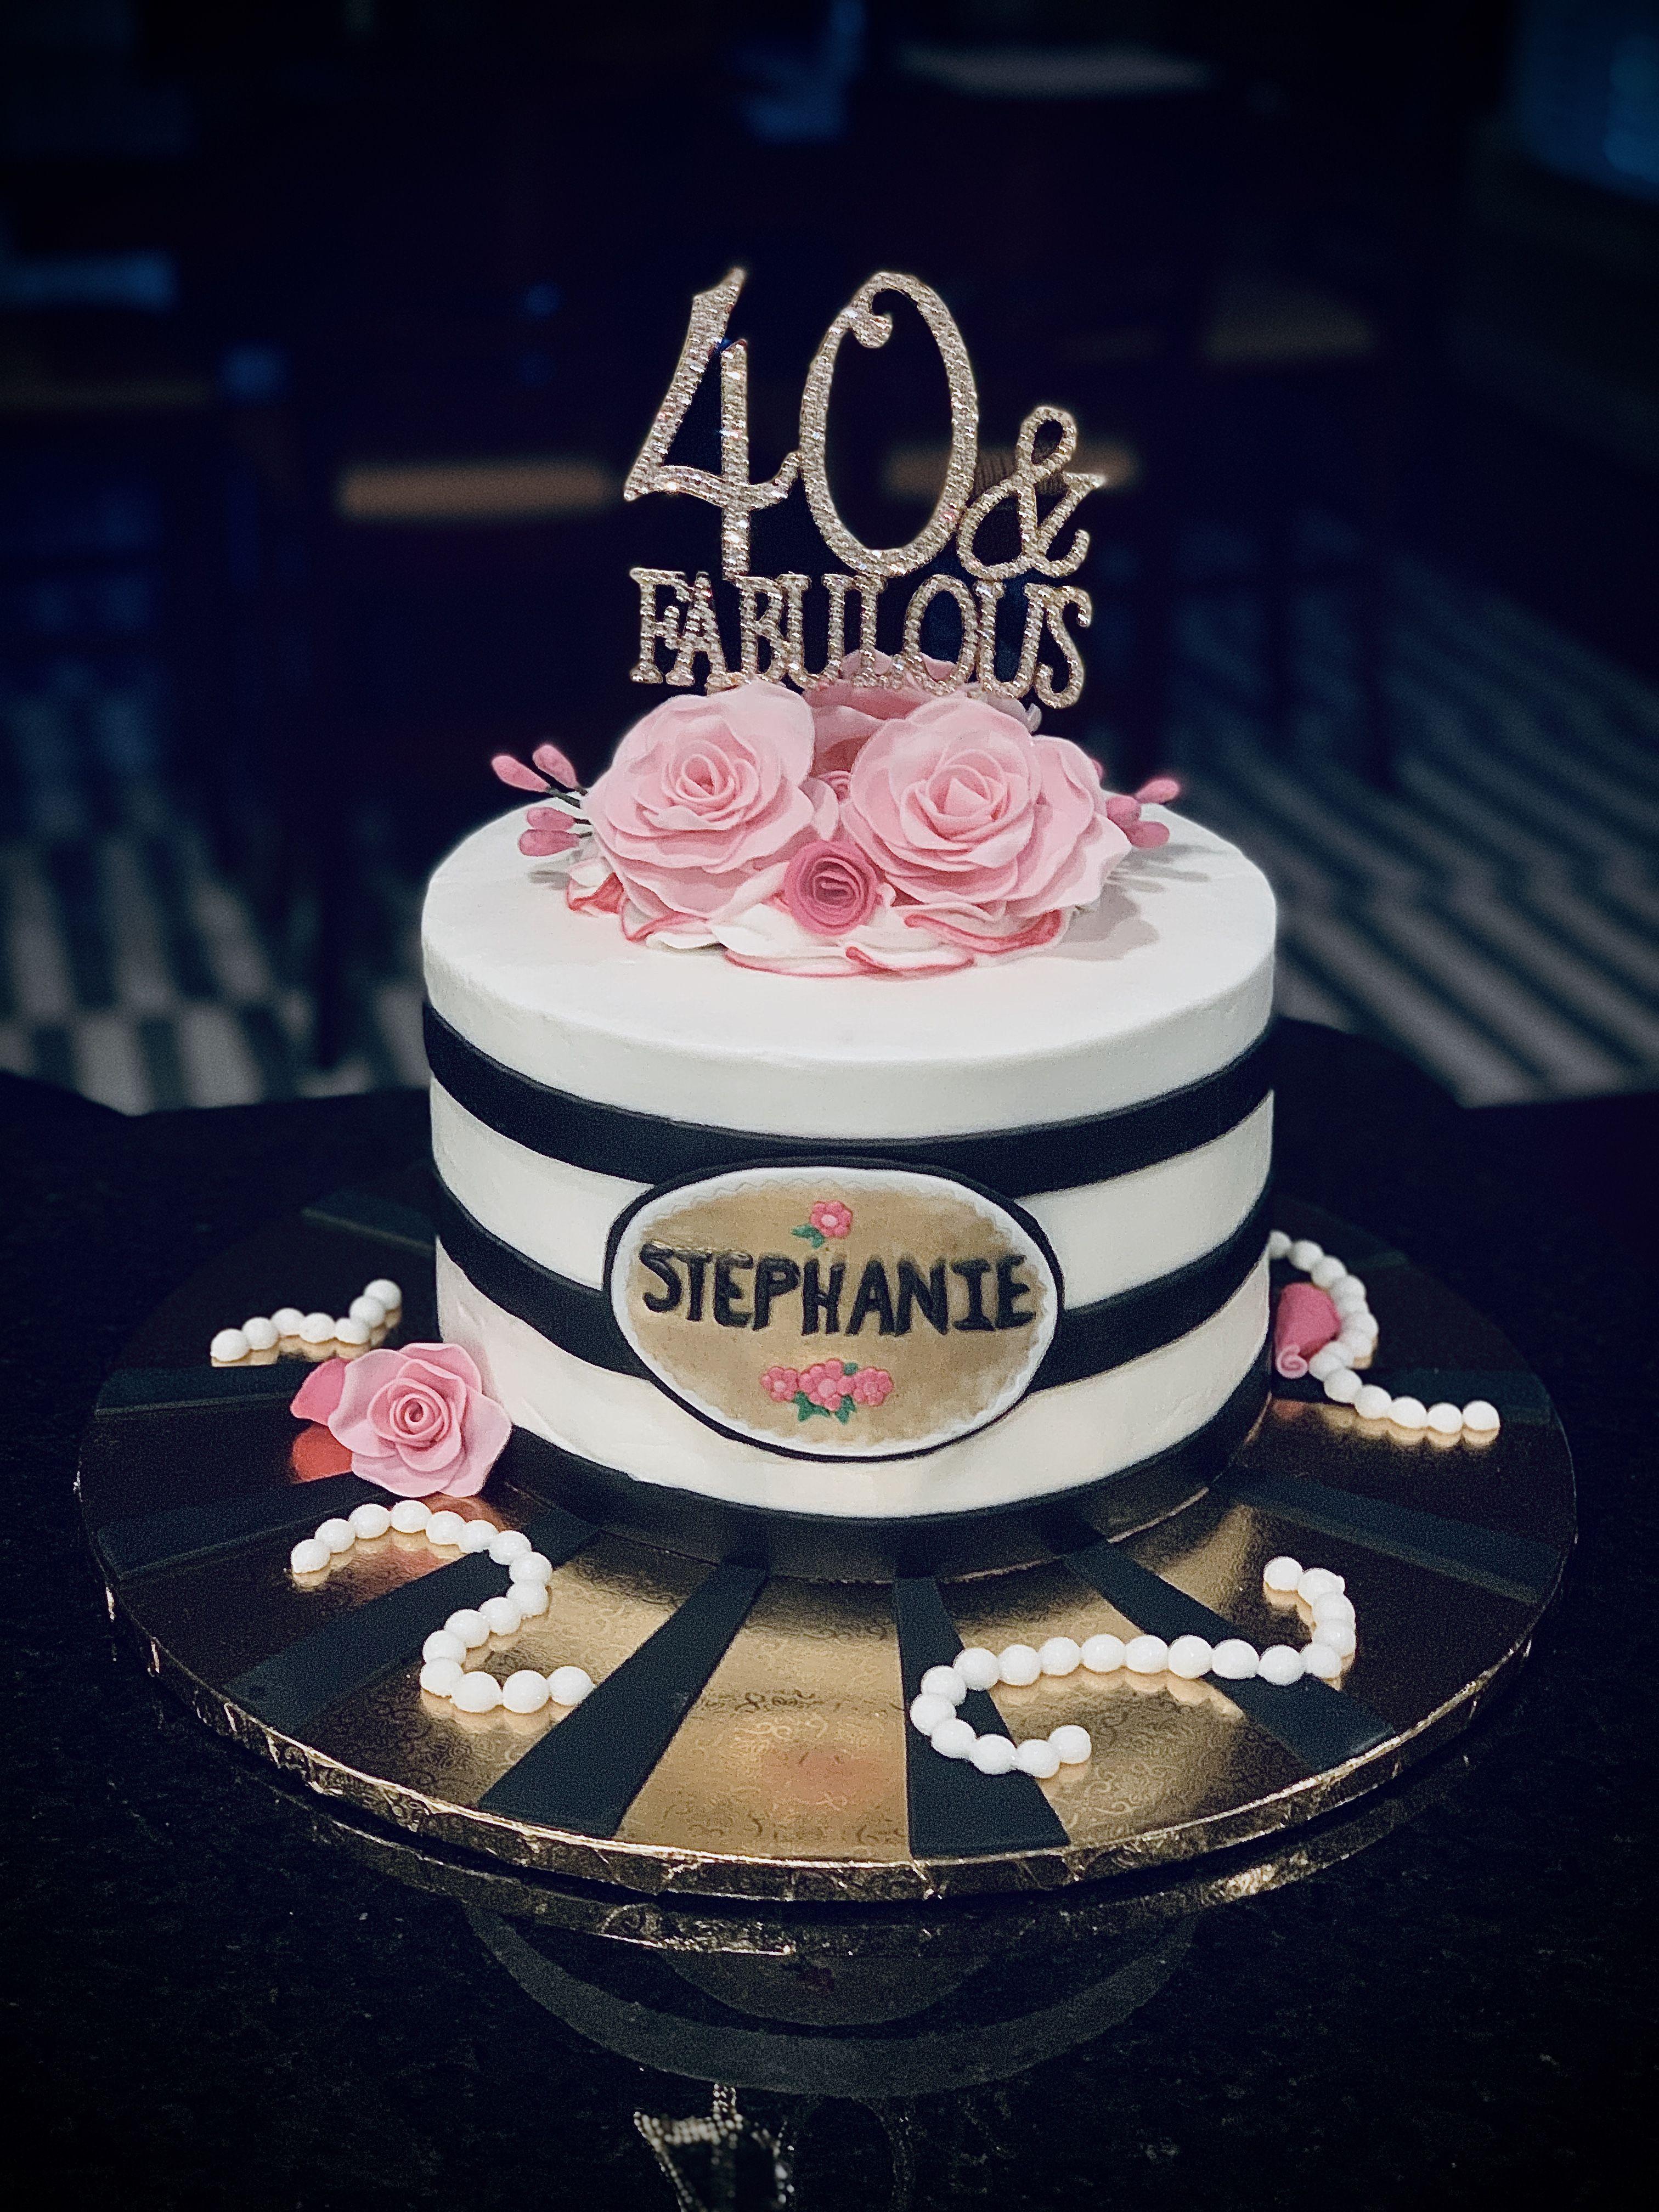 Happy 40th Birthday Stephanie Happy 40th Birthday